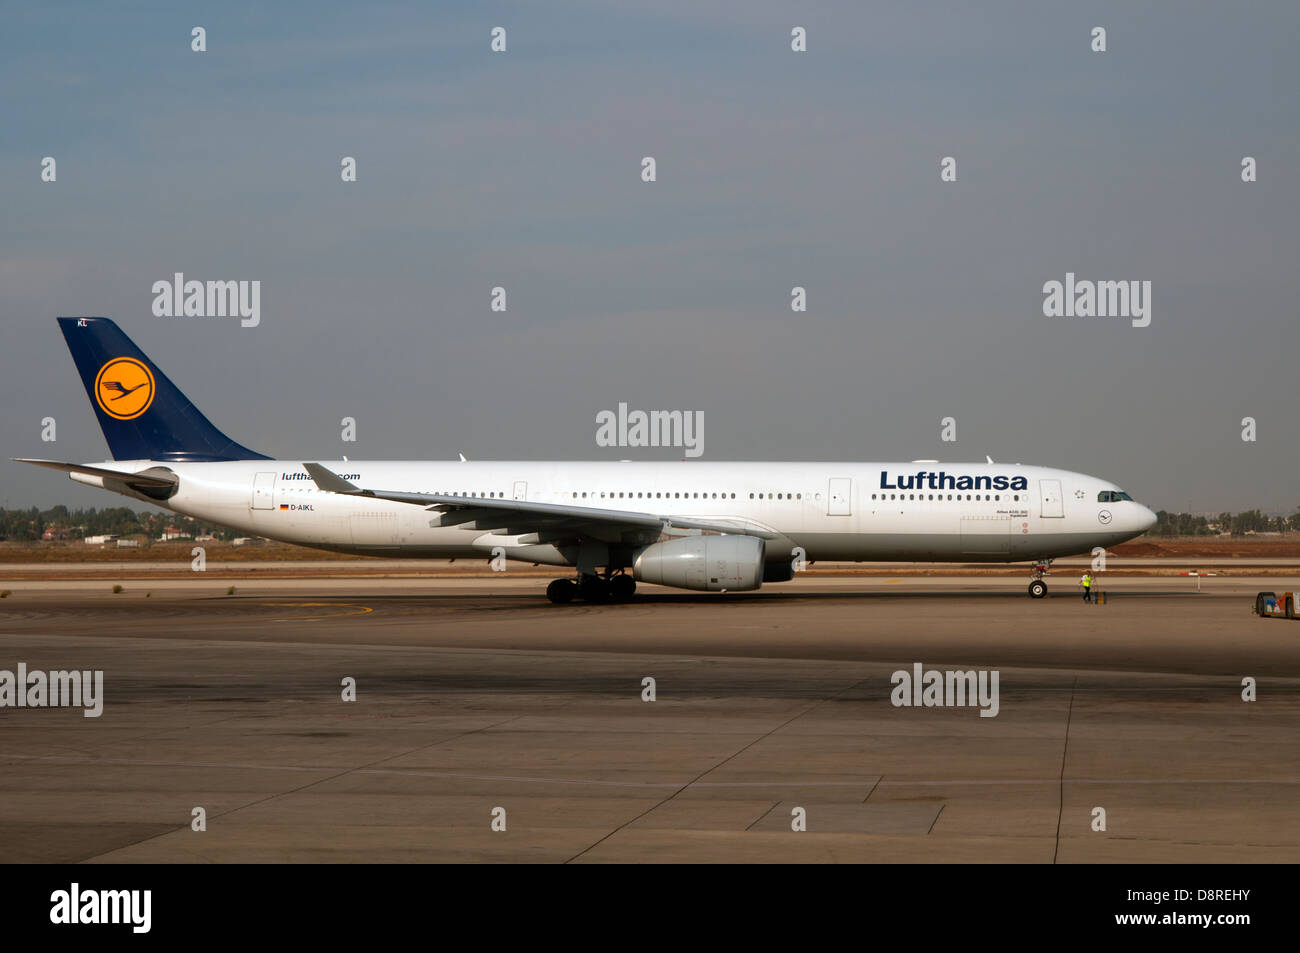 Lufthansa aircraft - Stock Image